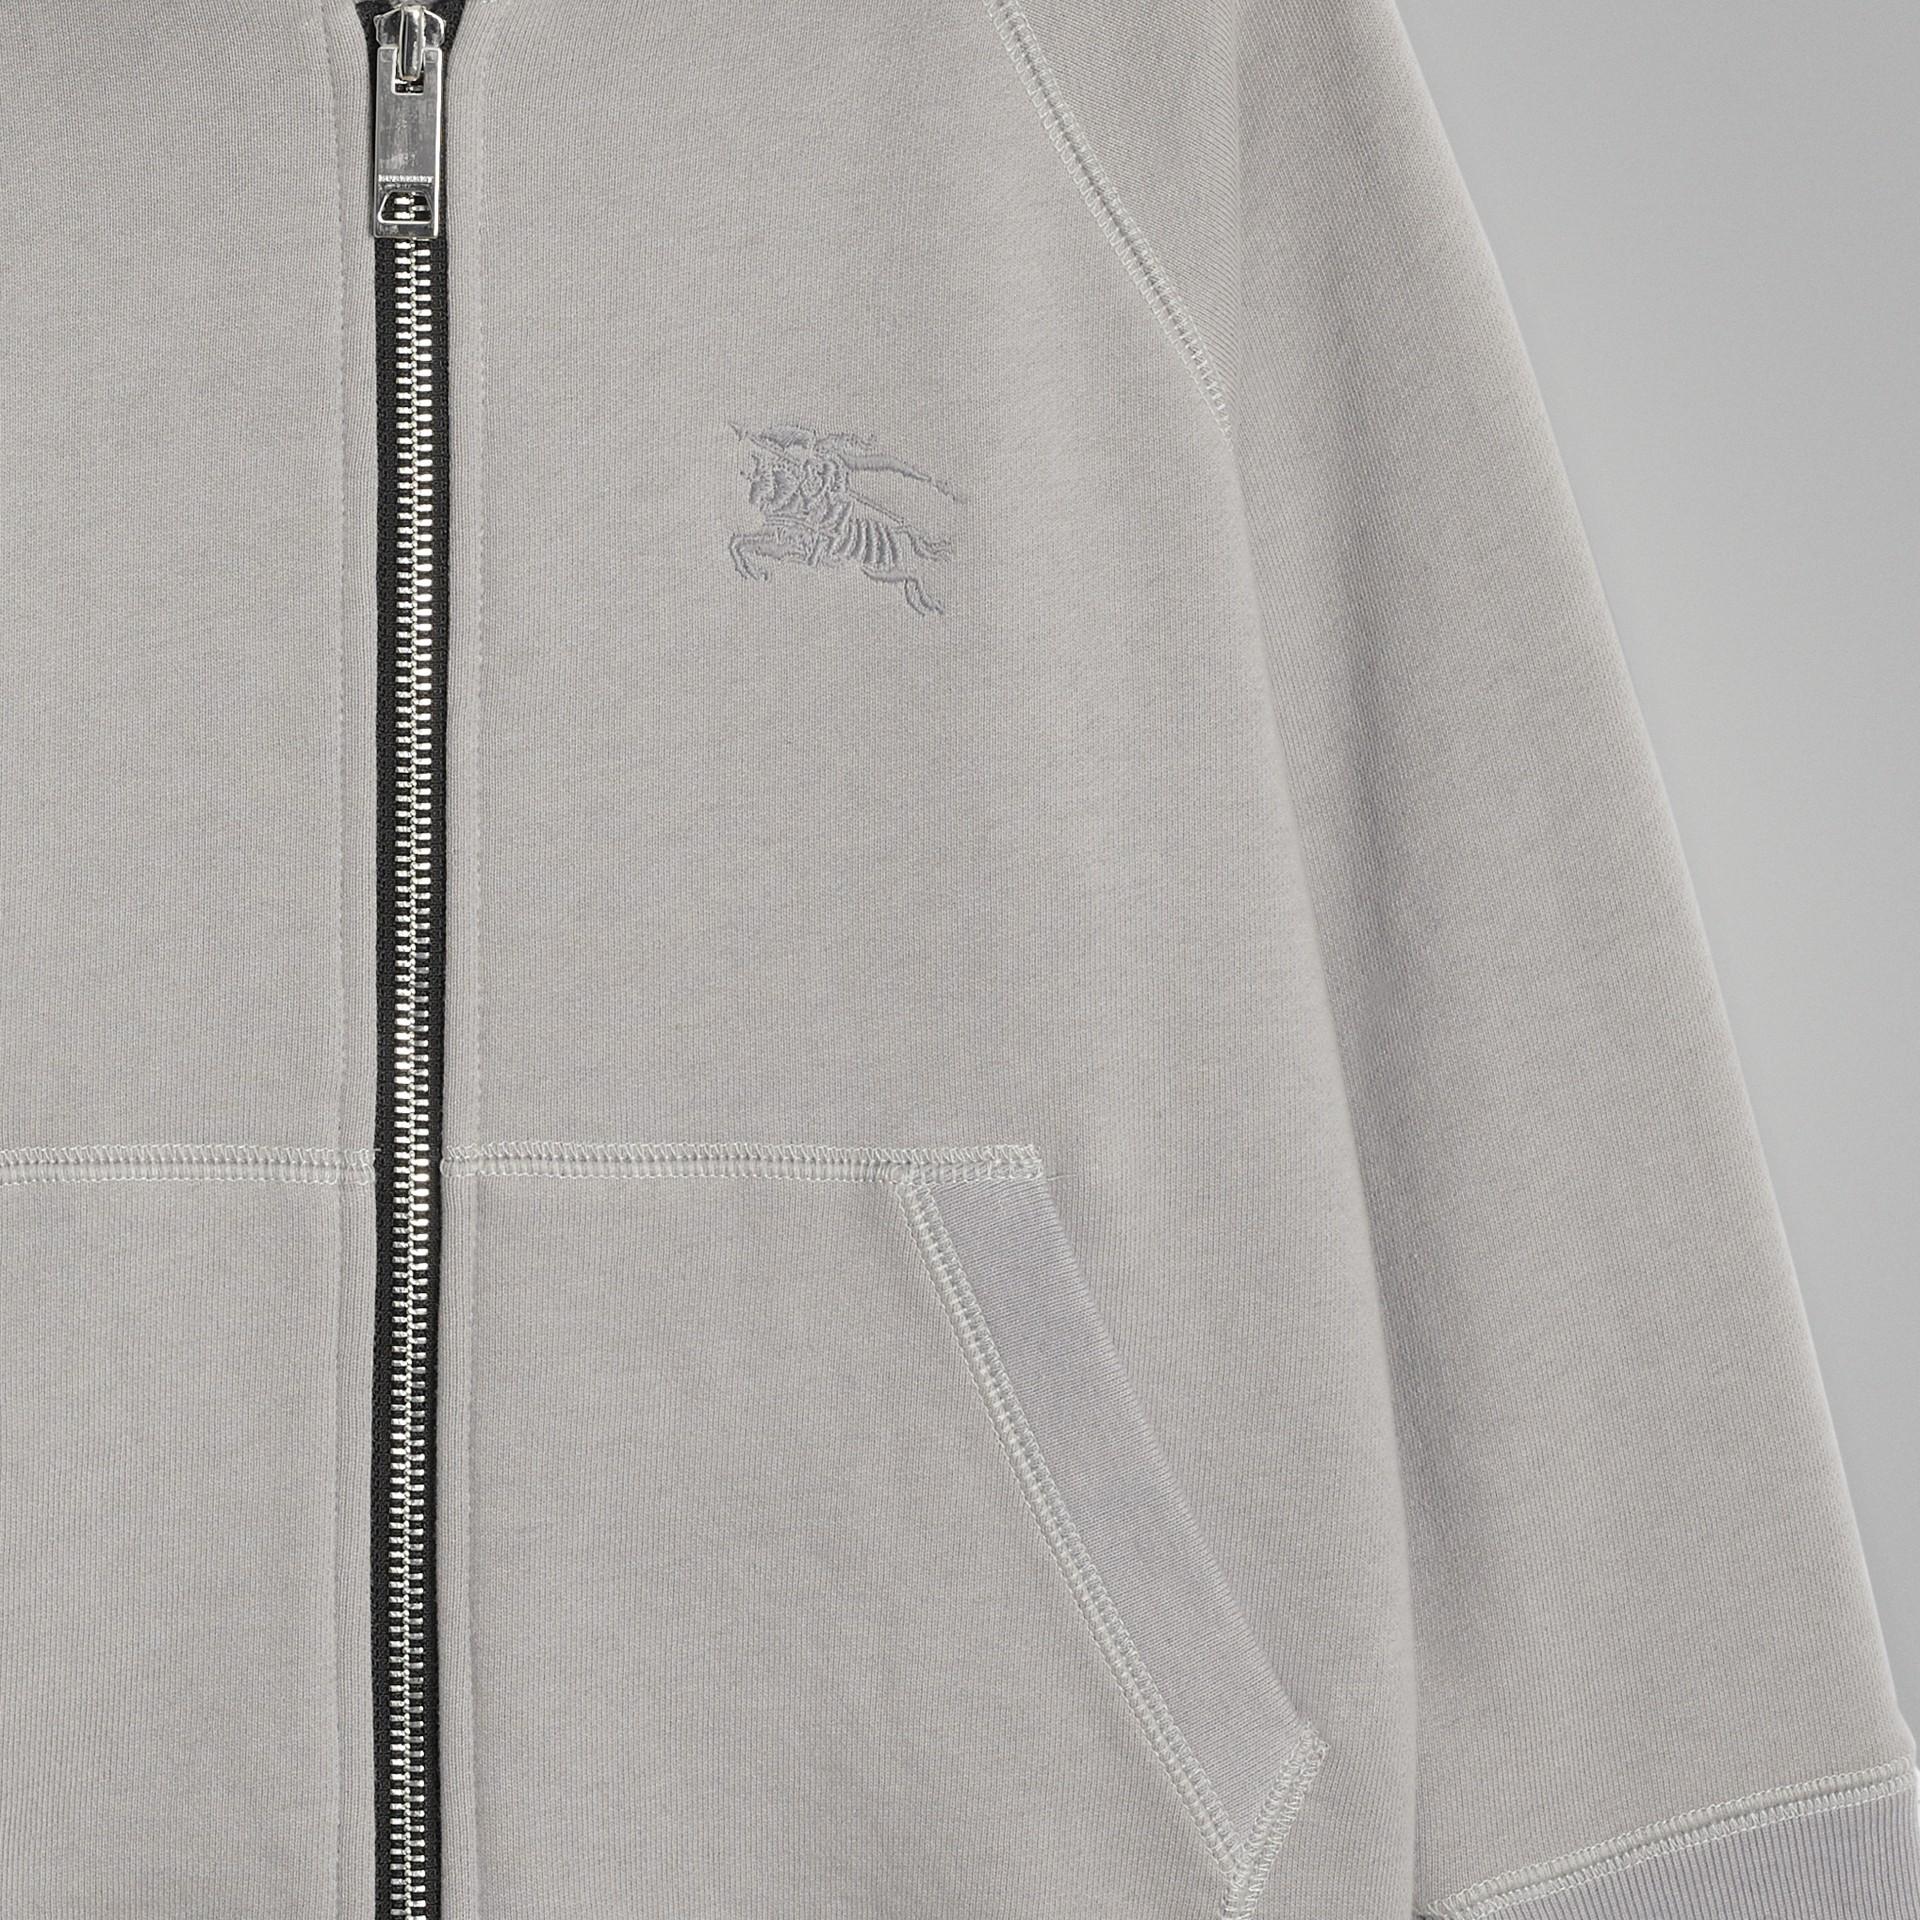 Cotton Jersey Hooded Top in Chalk Grey Melange | Burberry Australia - gallery image 4